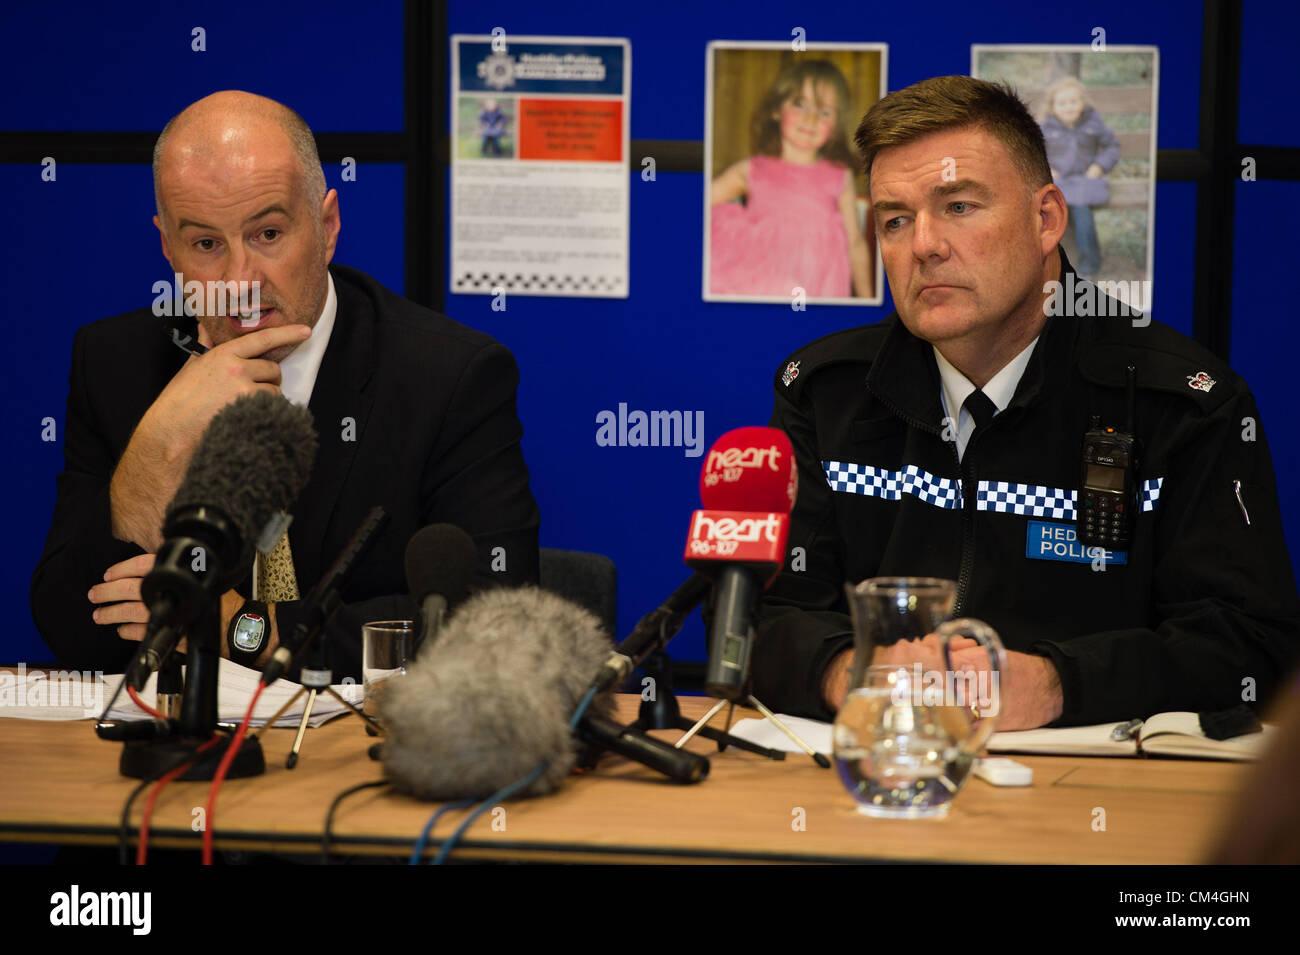 Oct 2 2012, Aberystwyth UK: Detective Superintendant REG BEVAN (left, suited) and Superintendant IAN JOHN (right, - Stock Image